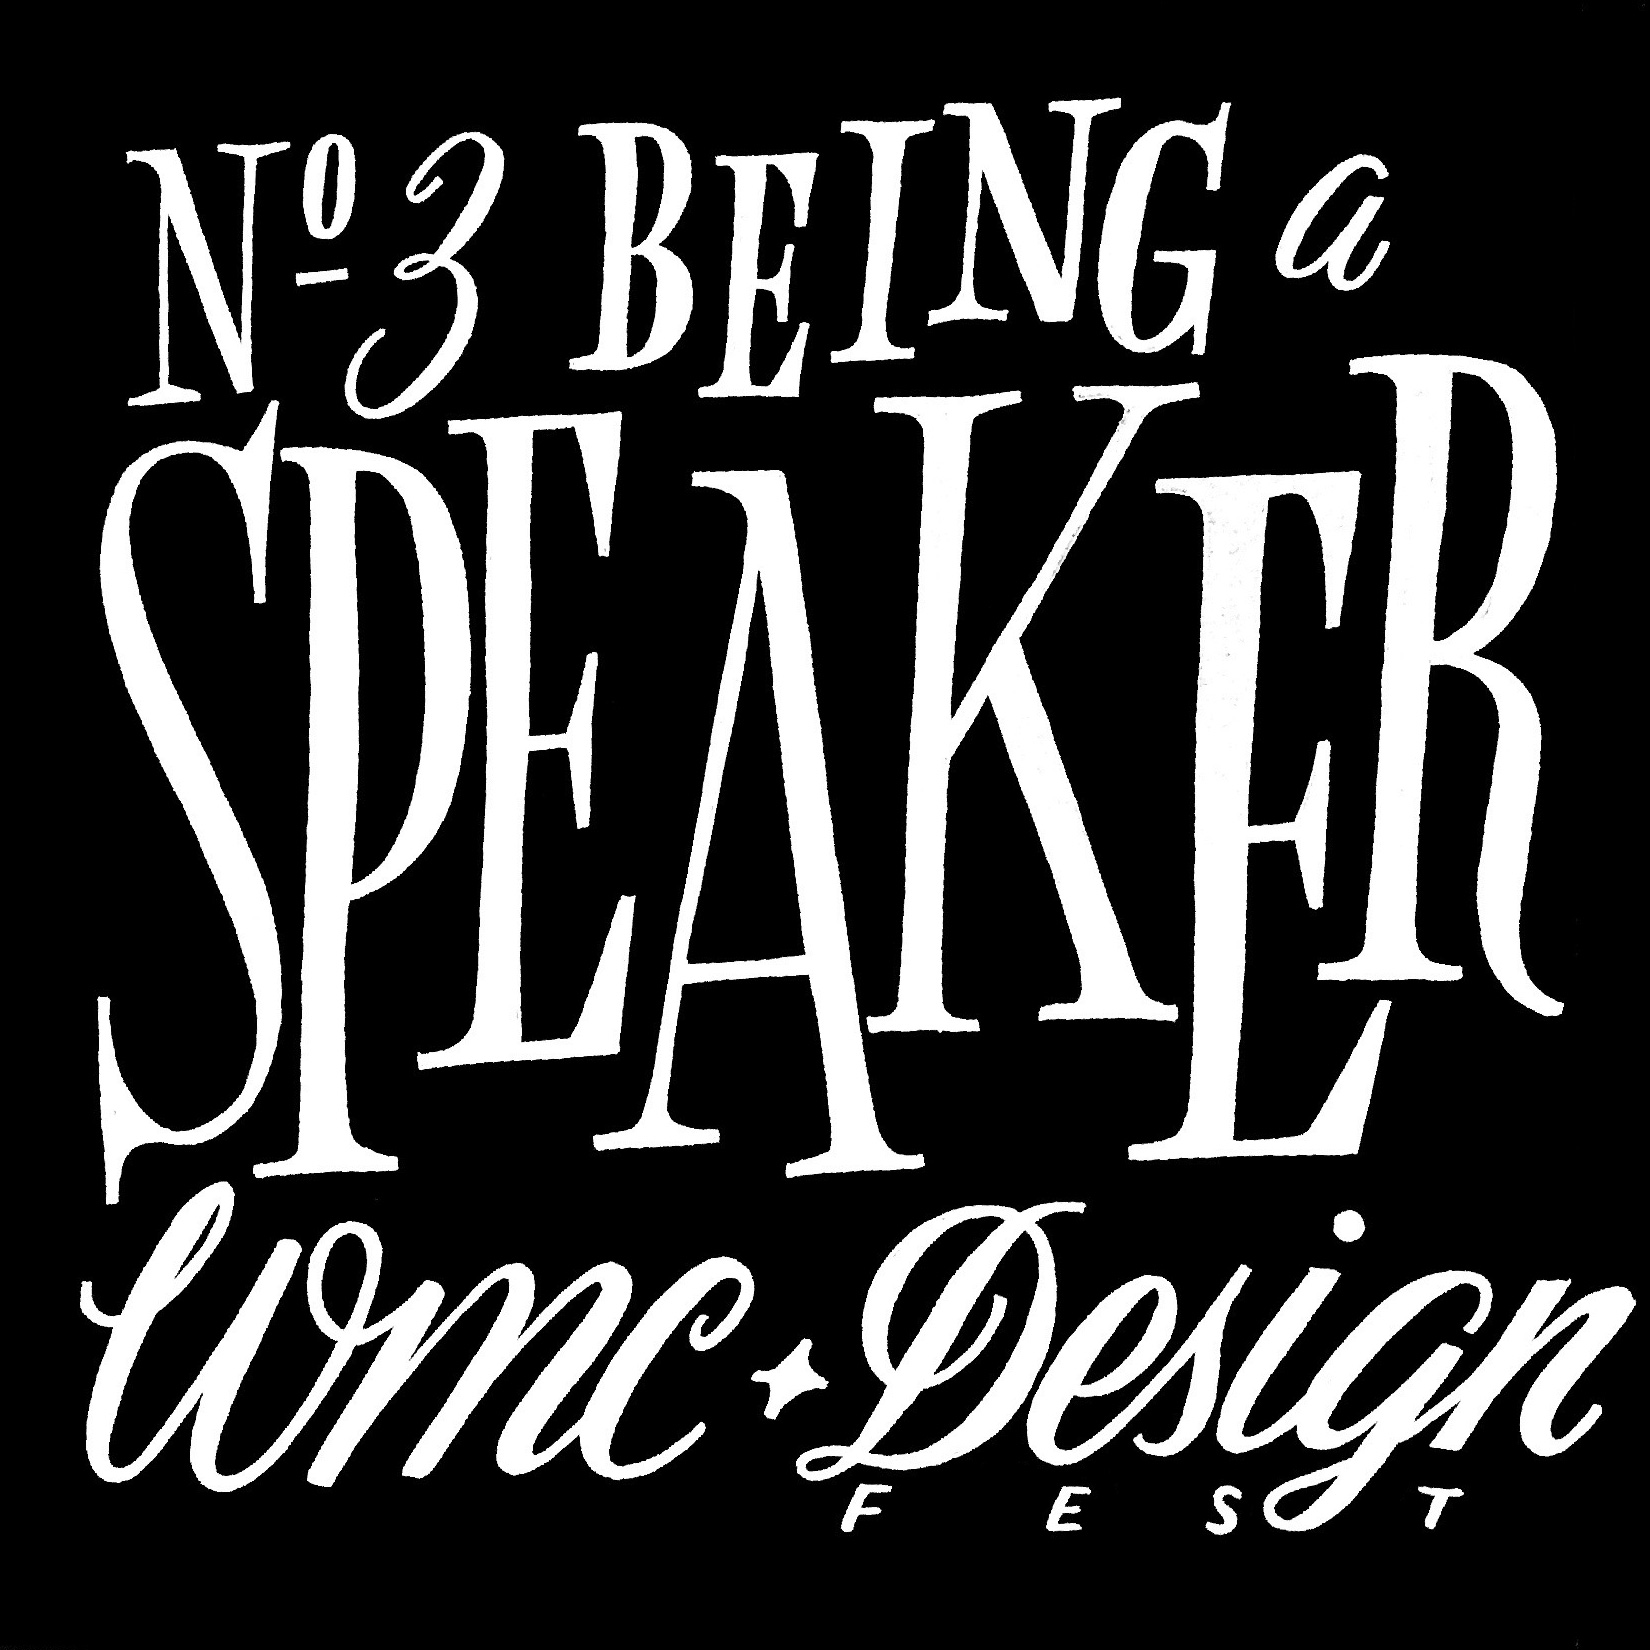 No3Speaking.jpg